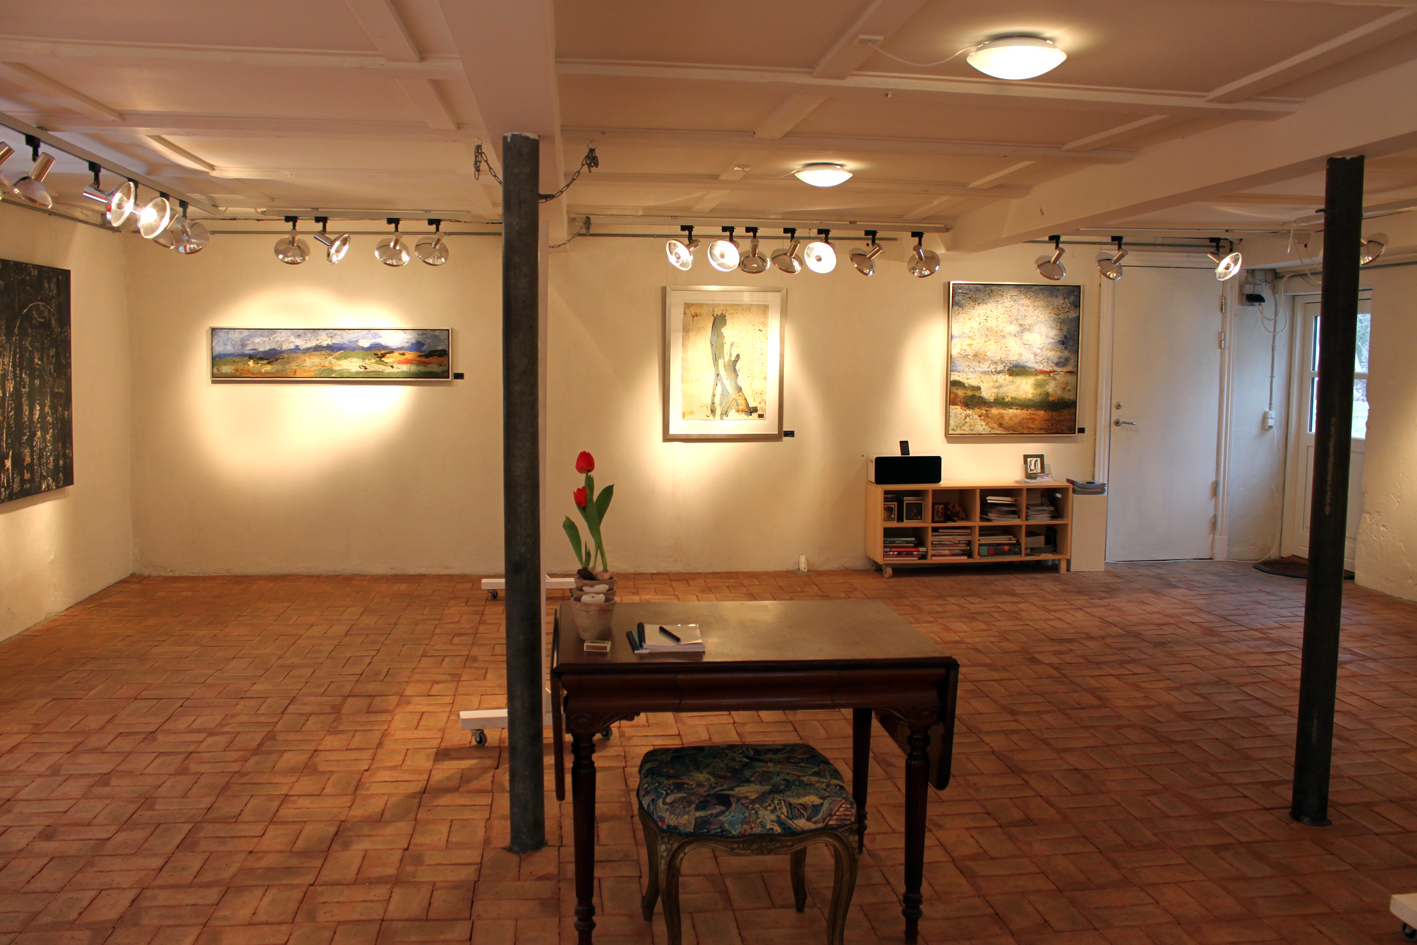 Galleri Ydo i Lille Viby